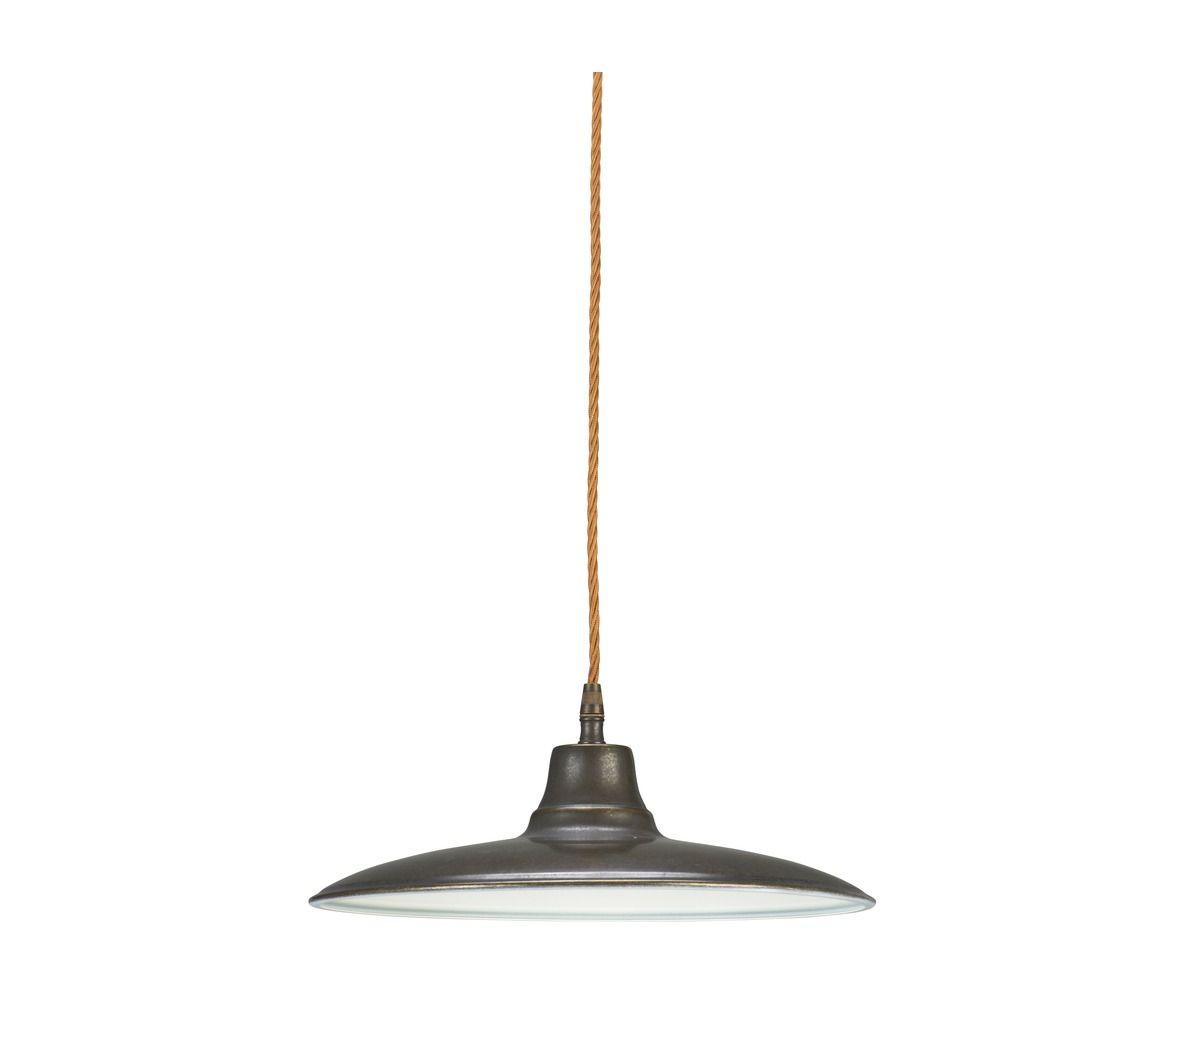 Aged brass pendant light thcvintage style lighting pinterest